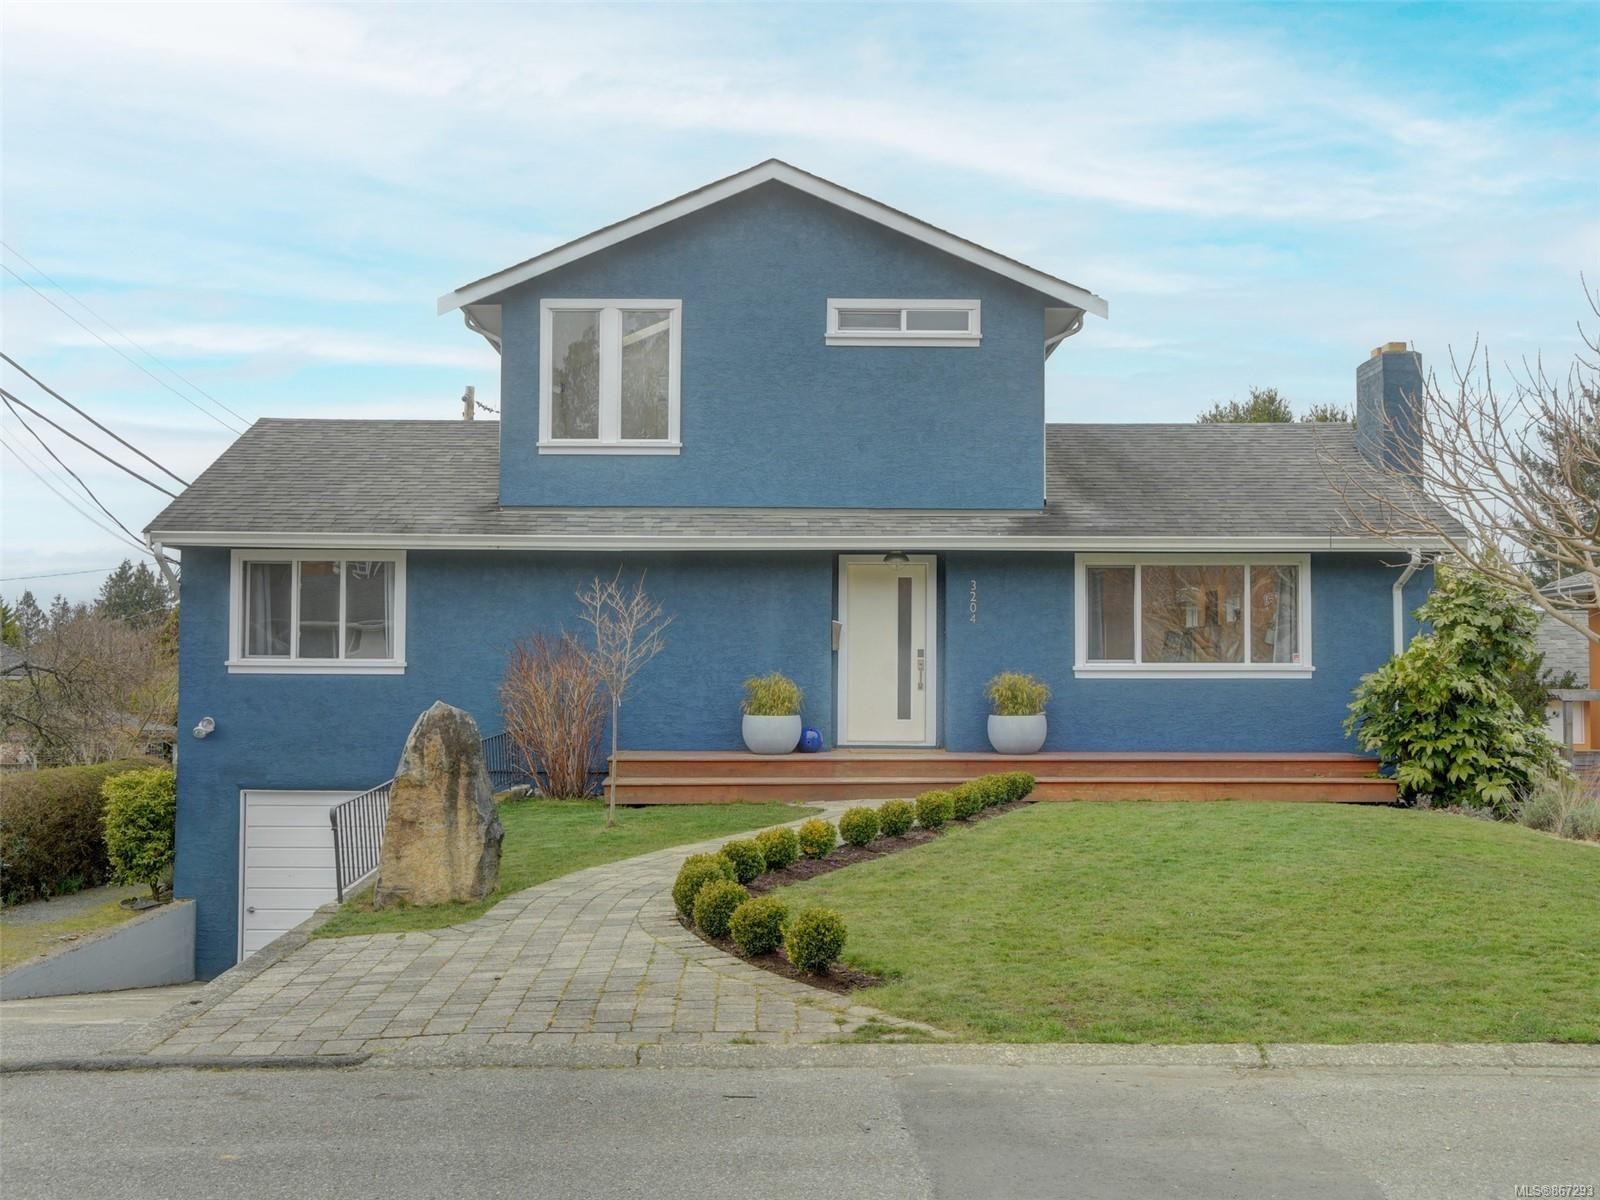 Main Photo: 3204 Frechette St in : SE Mt Tolmie House for sale (Saanich East)  : MLS®# 867293